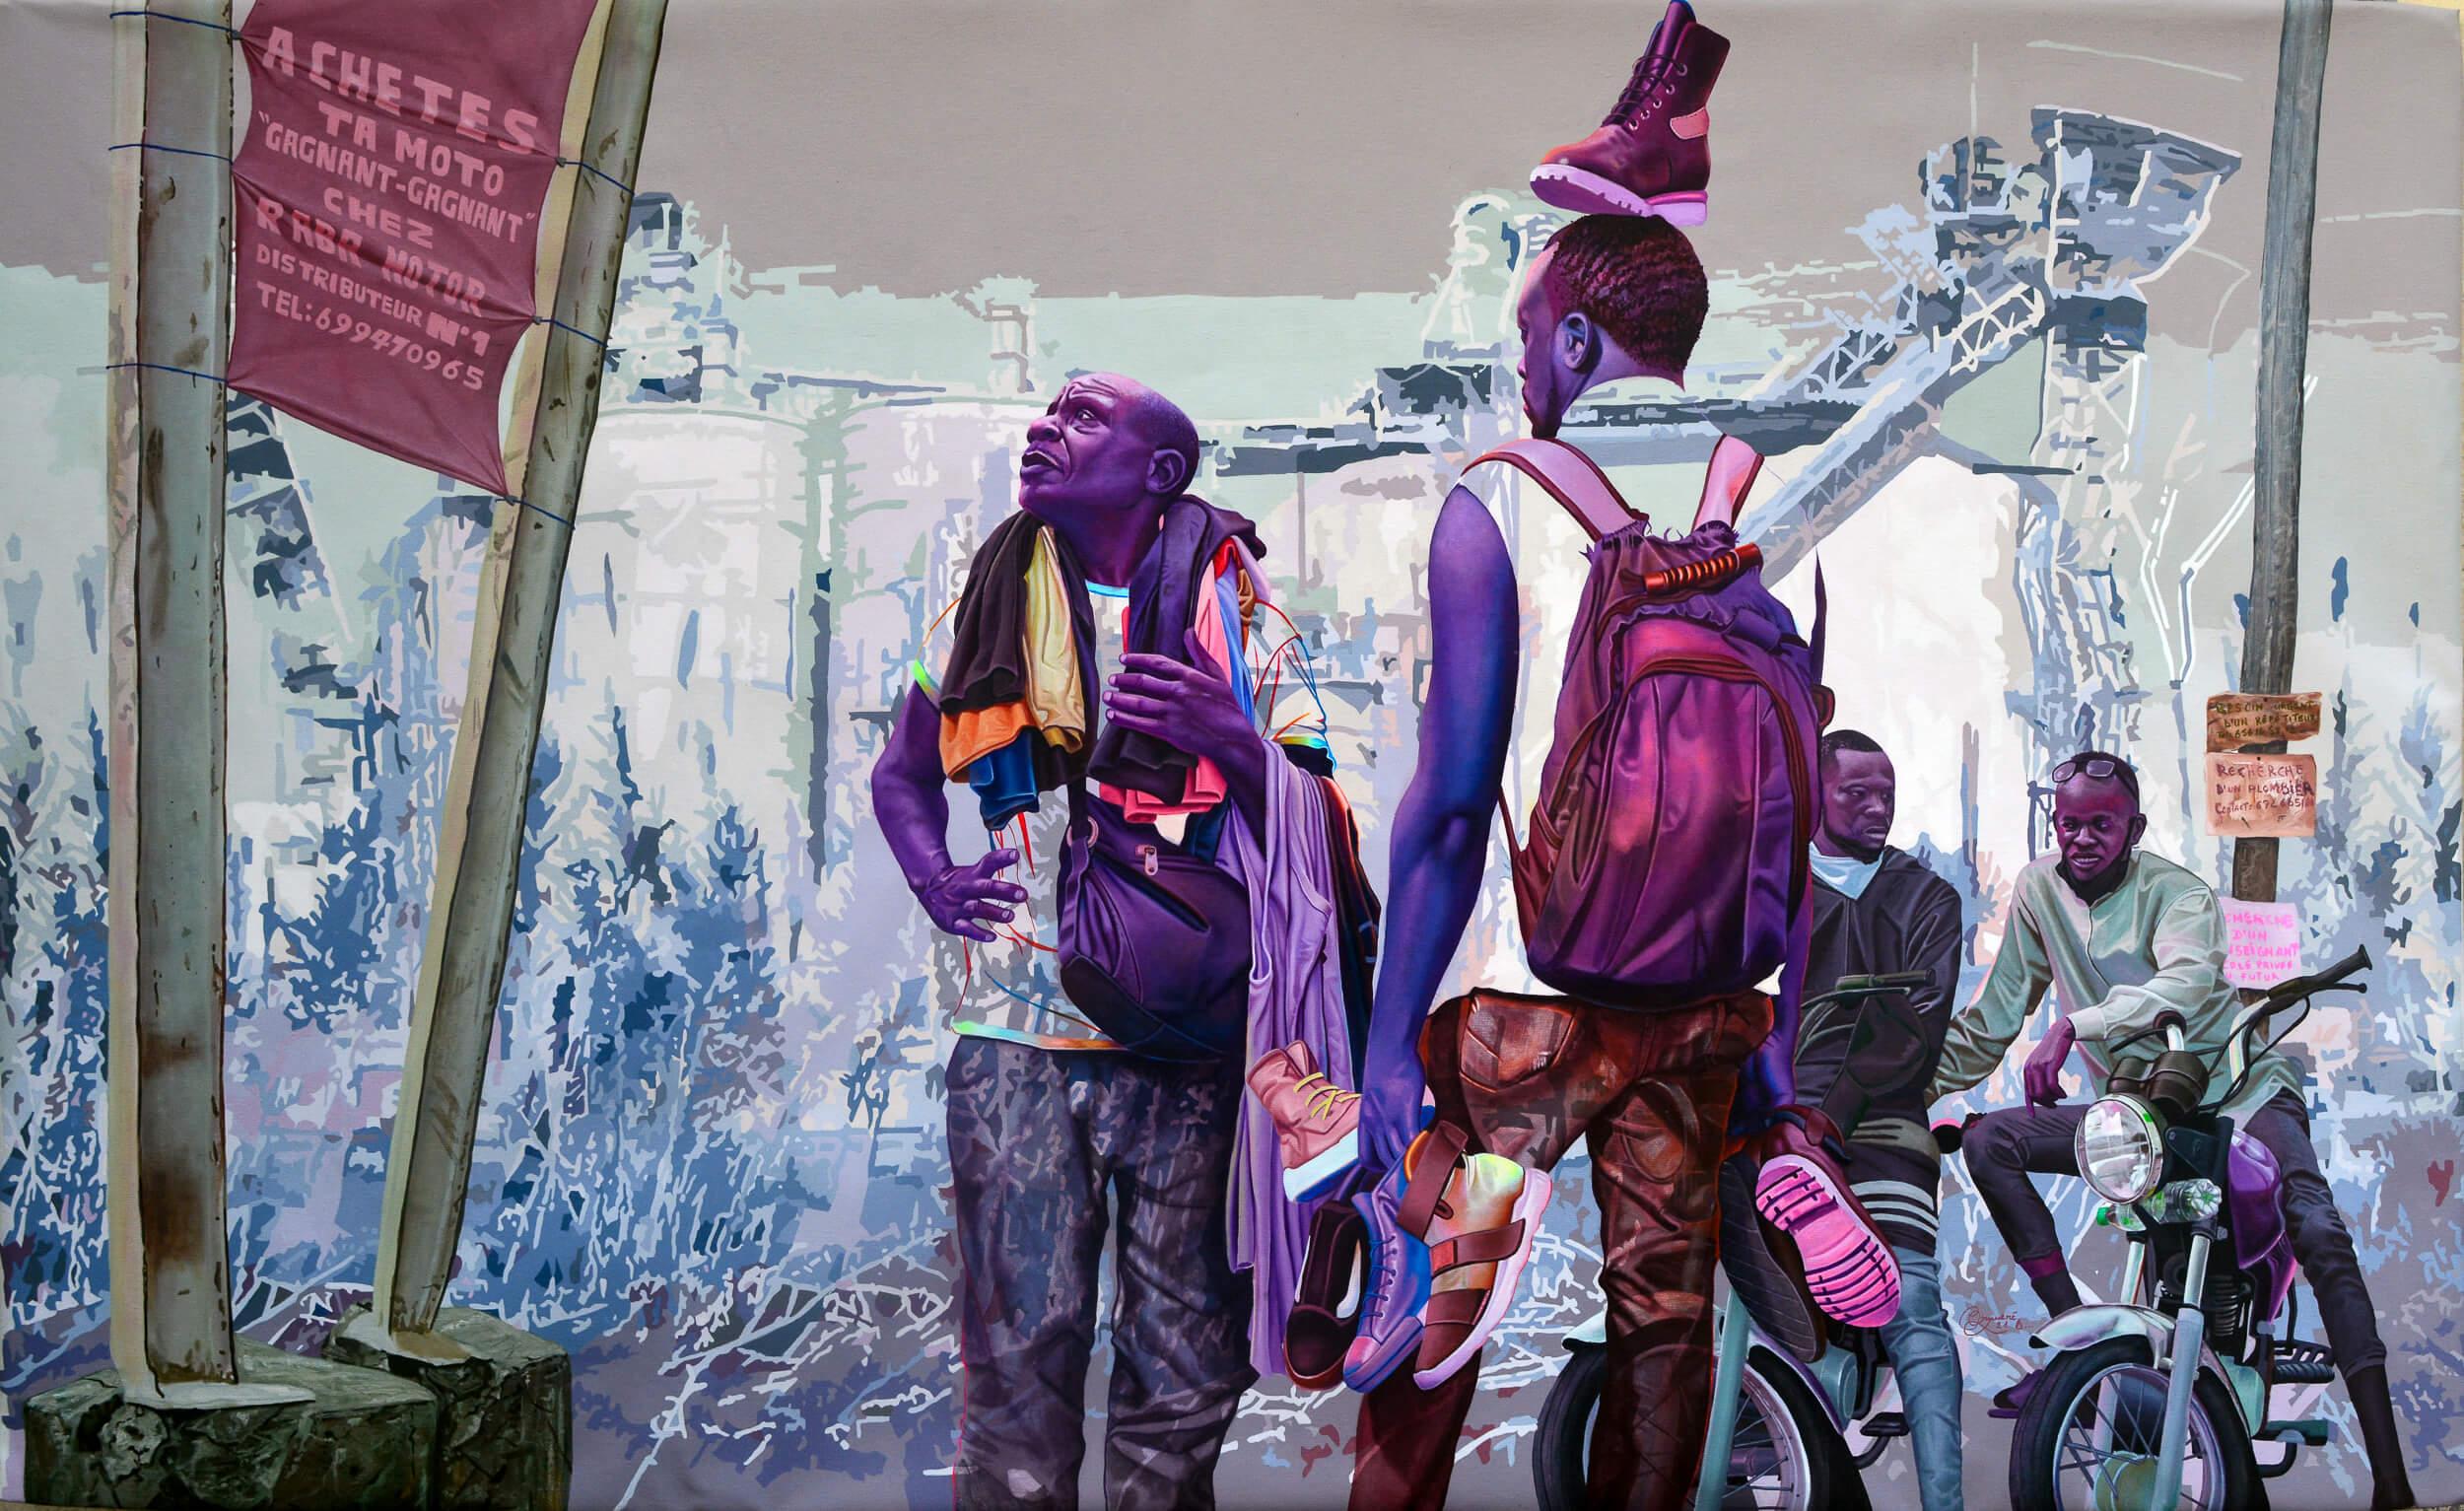 artsy-Daniel Onguene - L'annonce divine - 2021 - 120cm H x 200cm W - Acrylic on canvas -2105